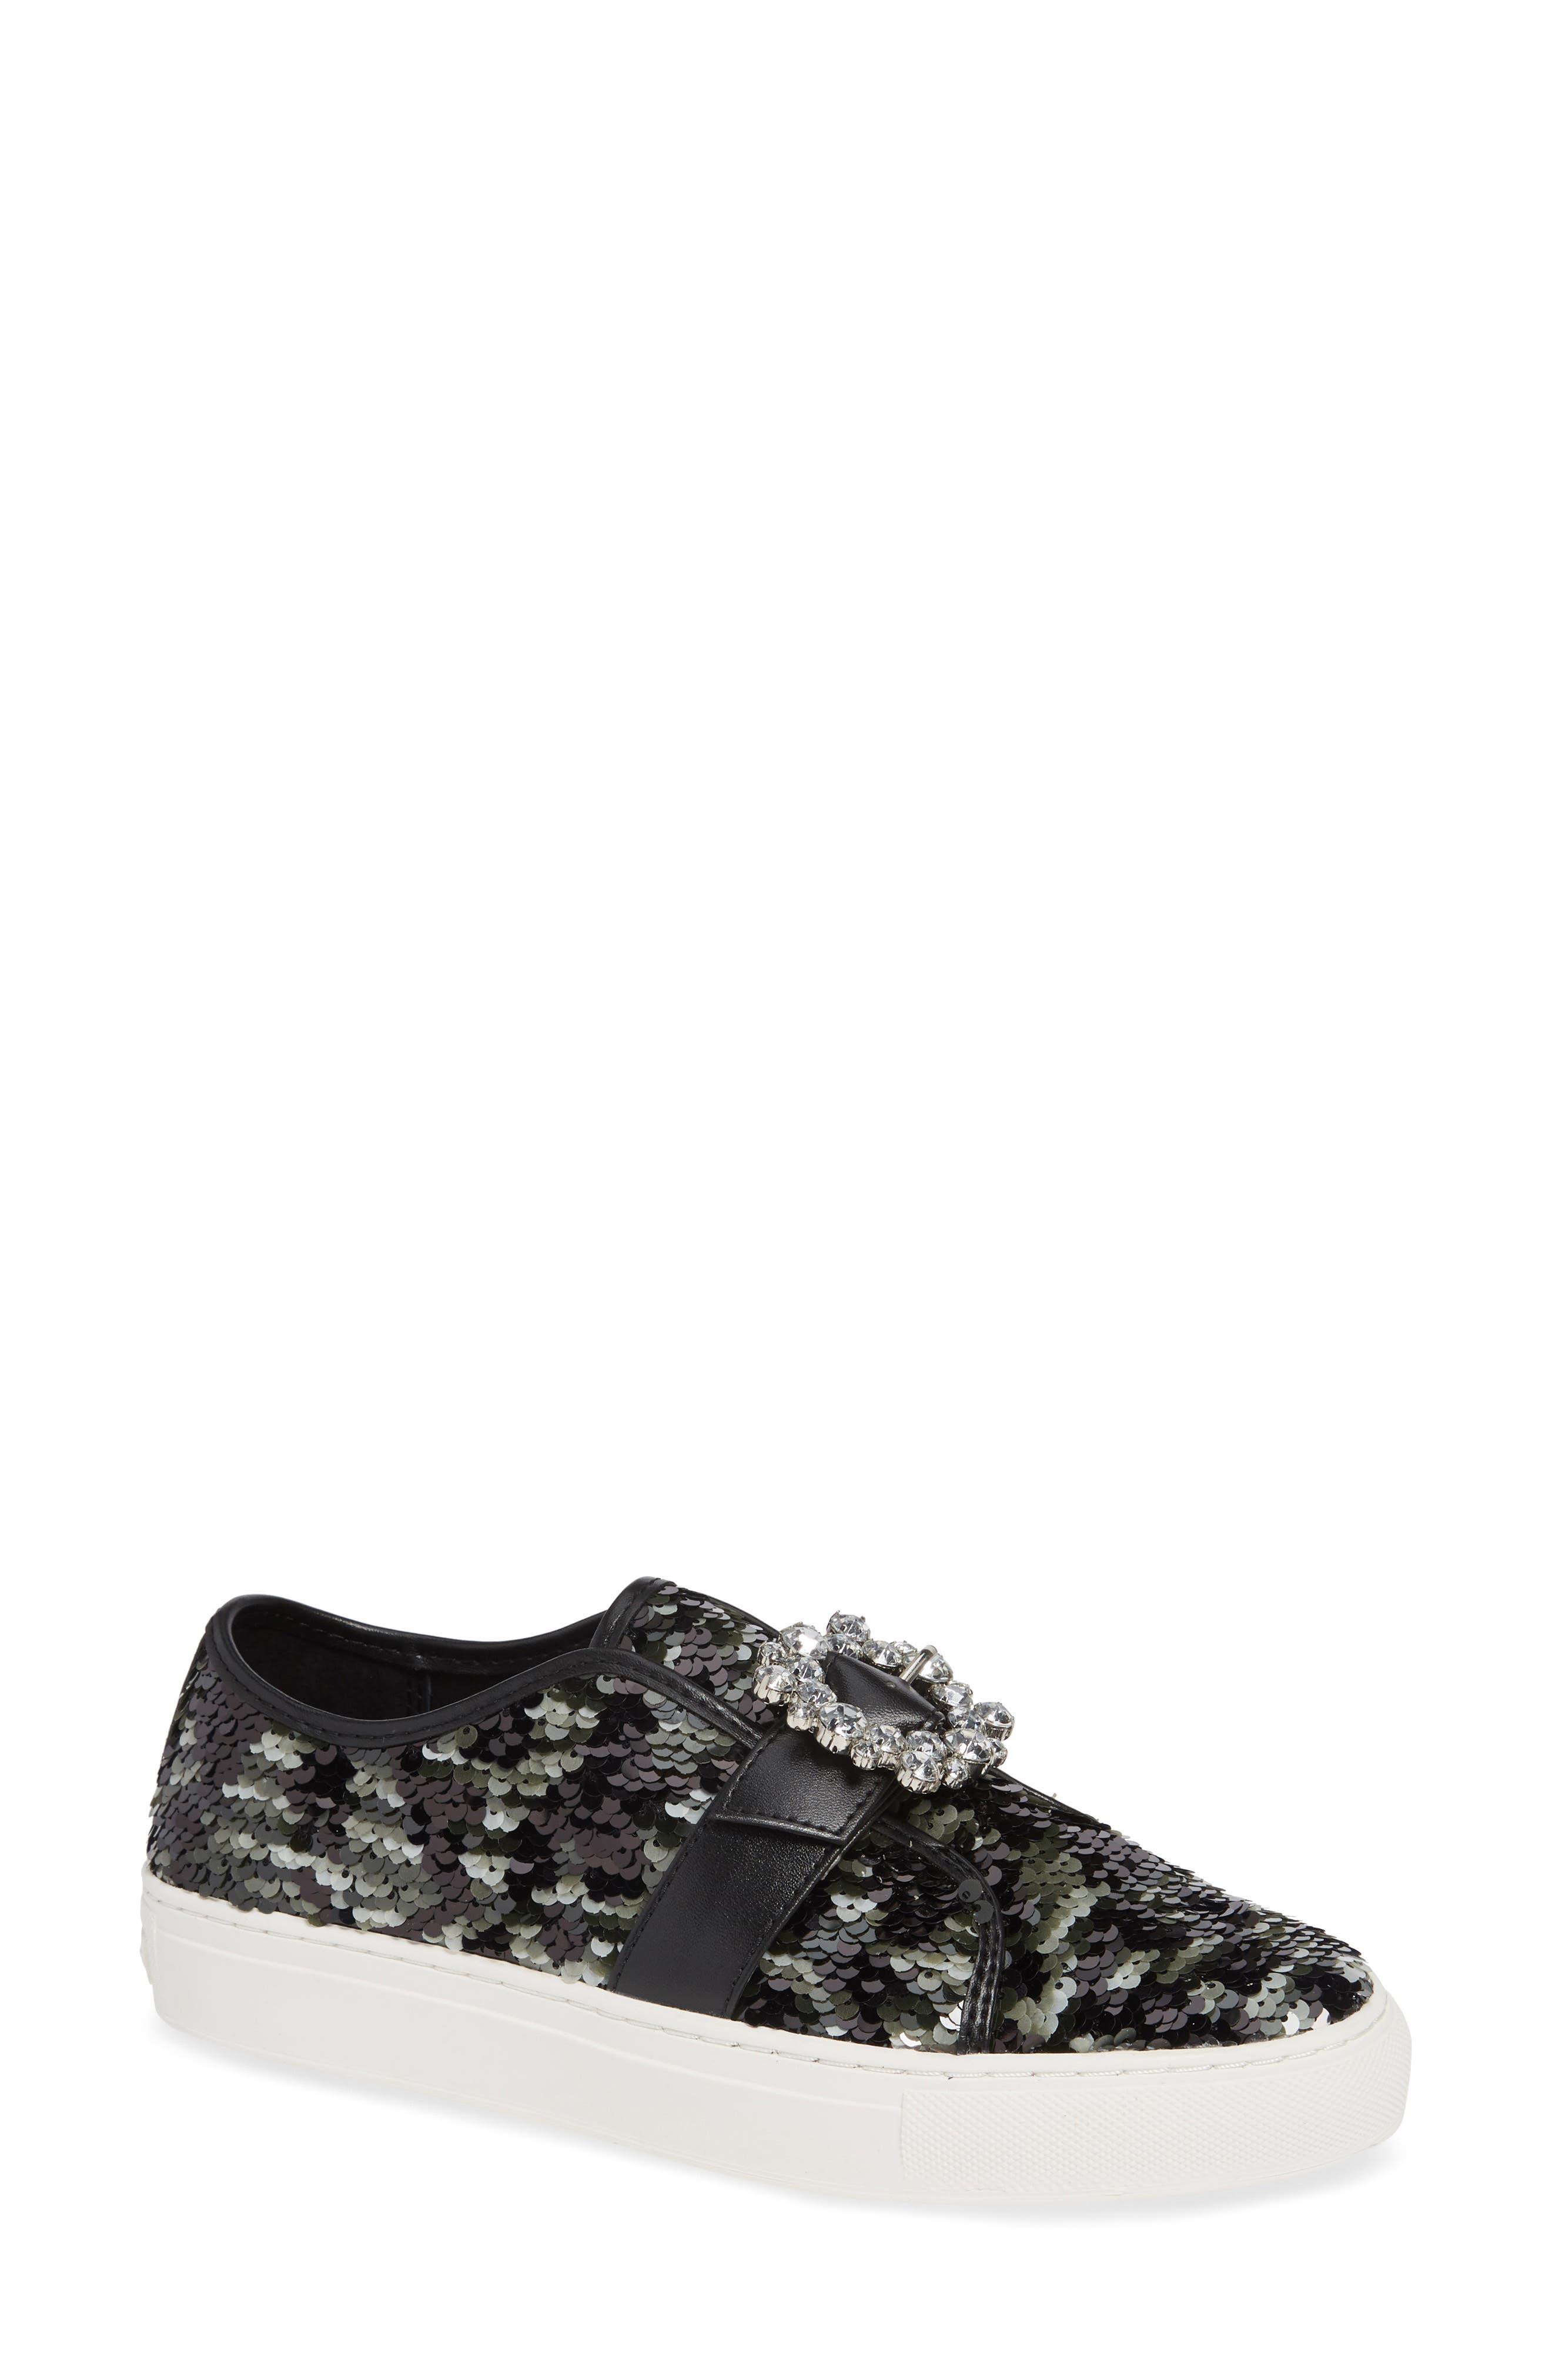 Platform Sneaker in Black